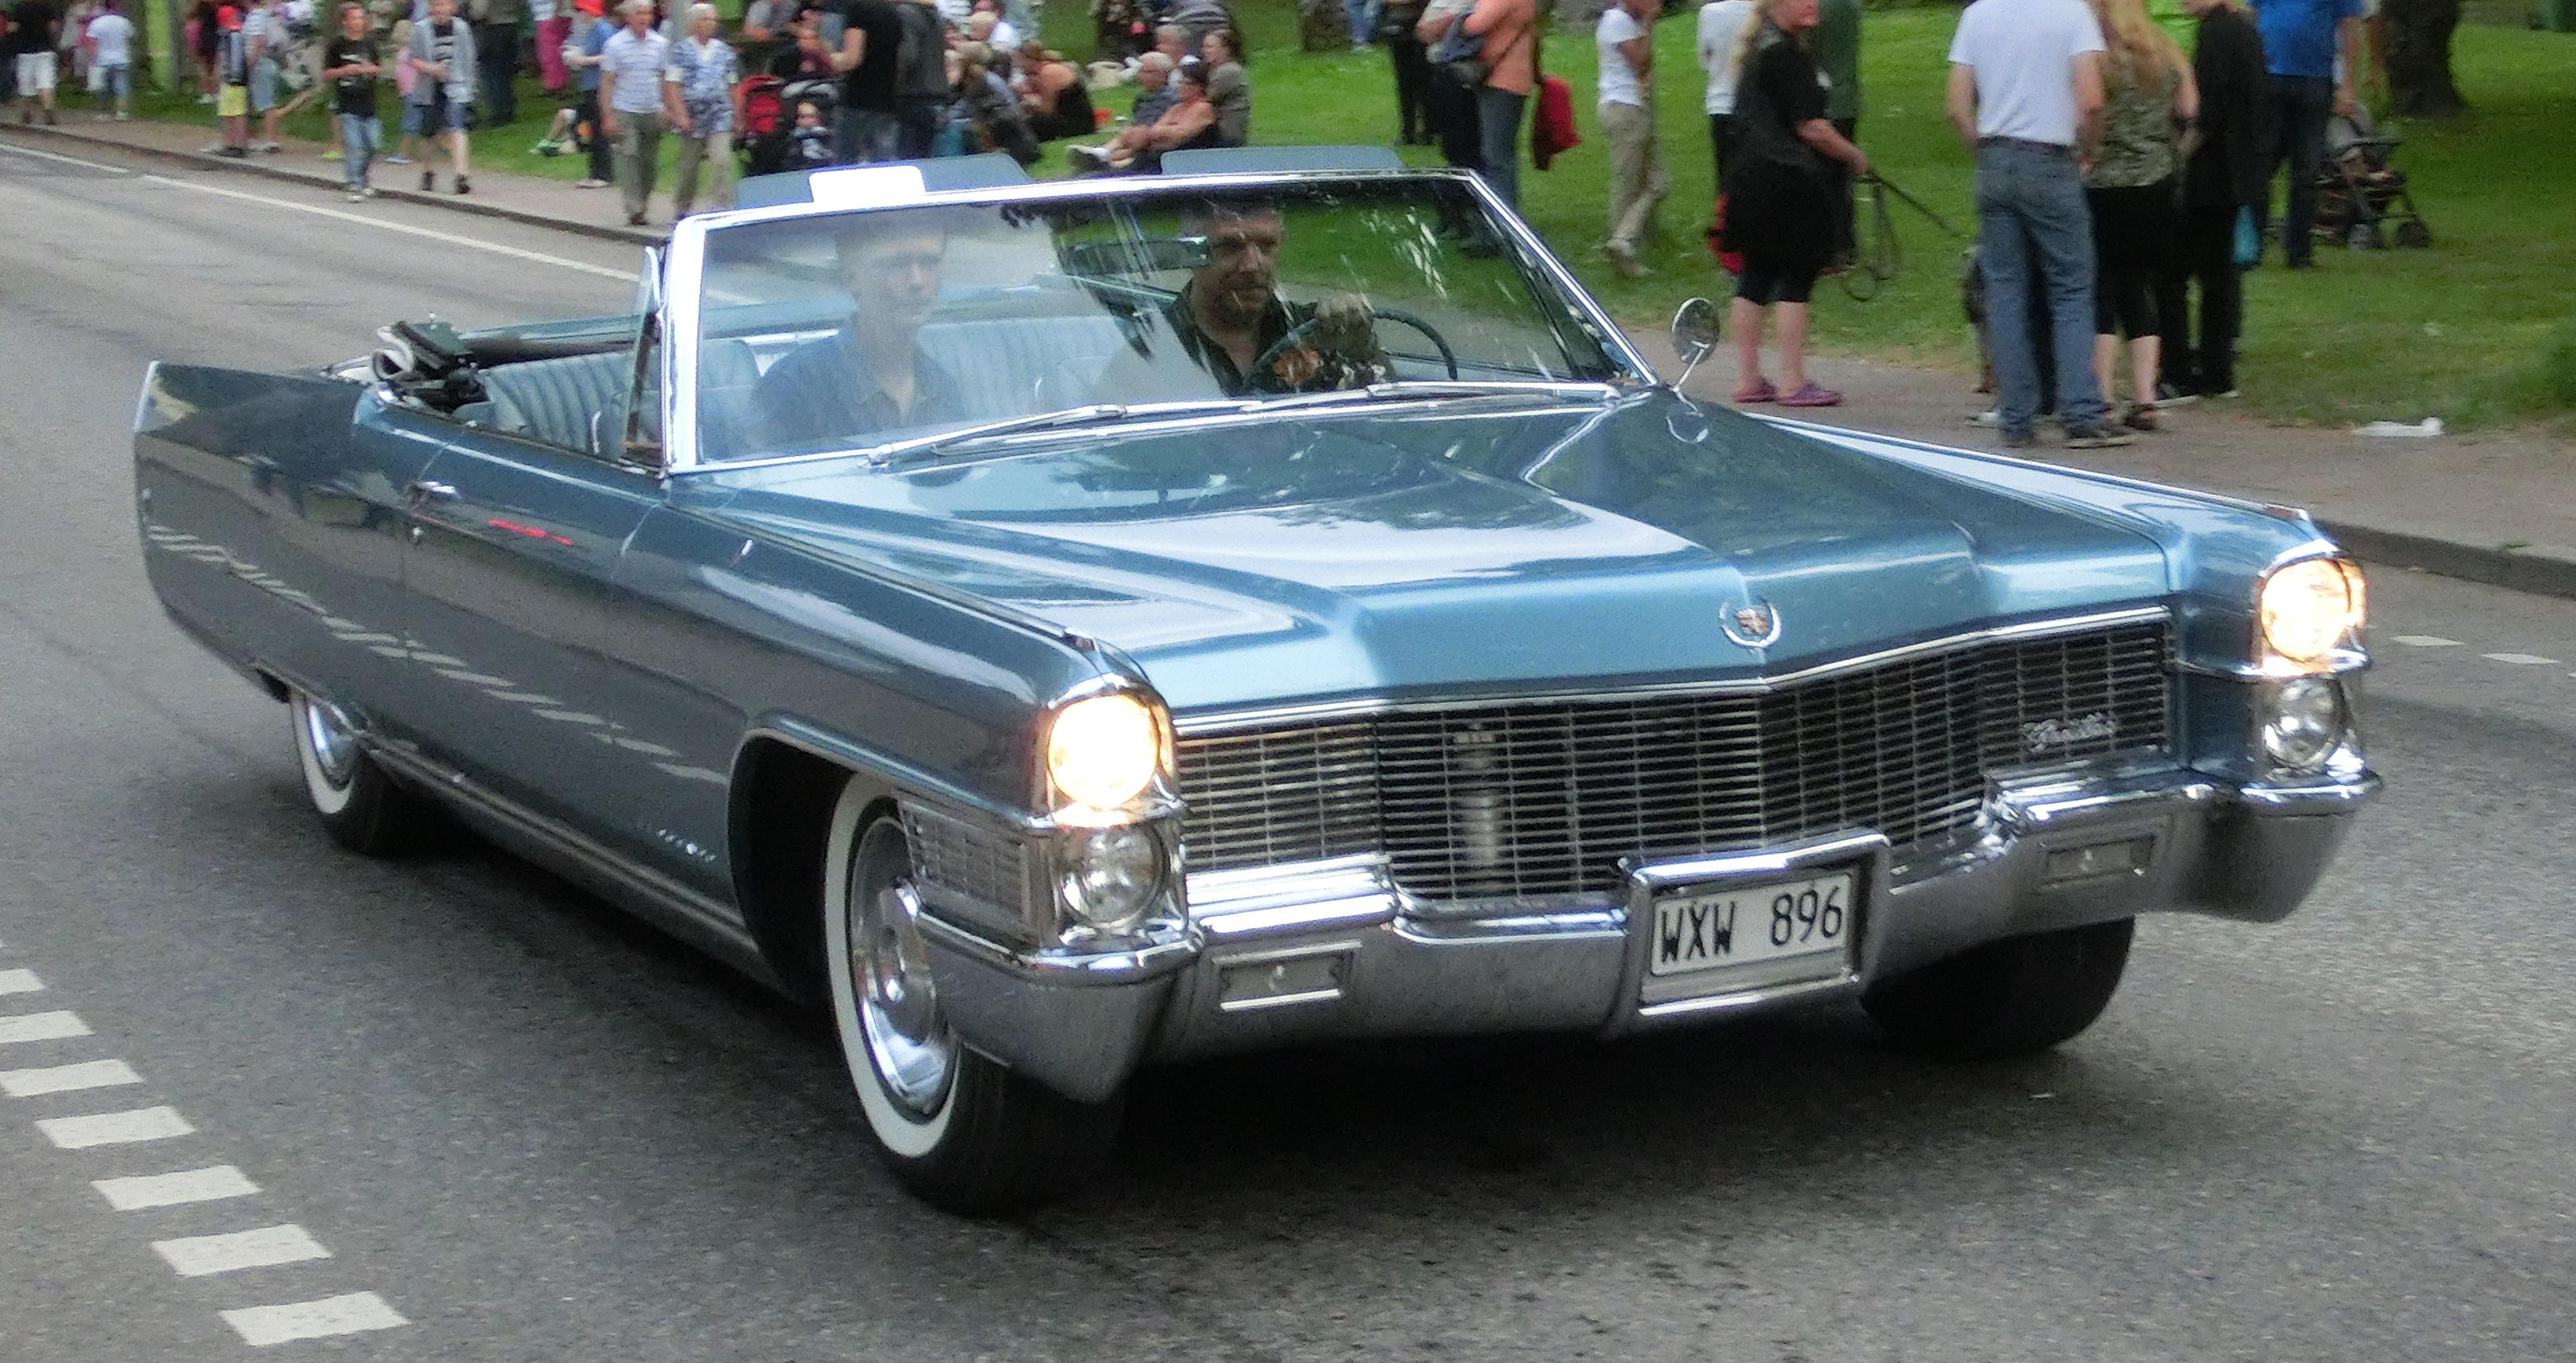 2013 Cadillac Convertible File:cadillac eldorado